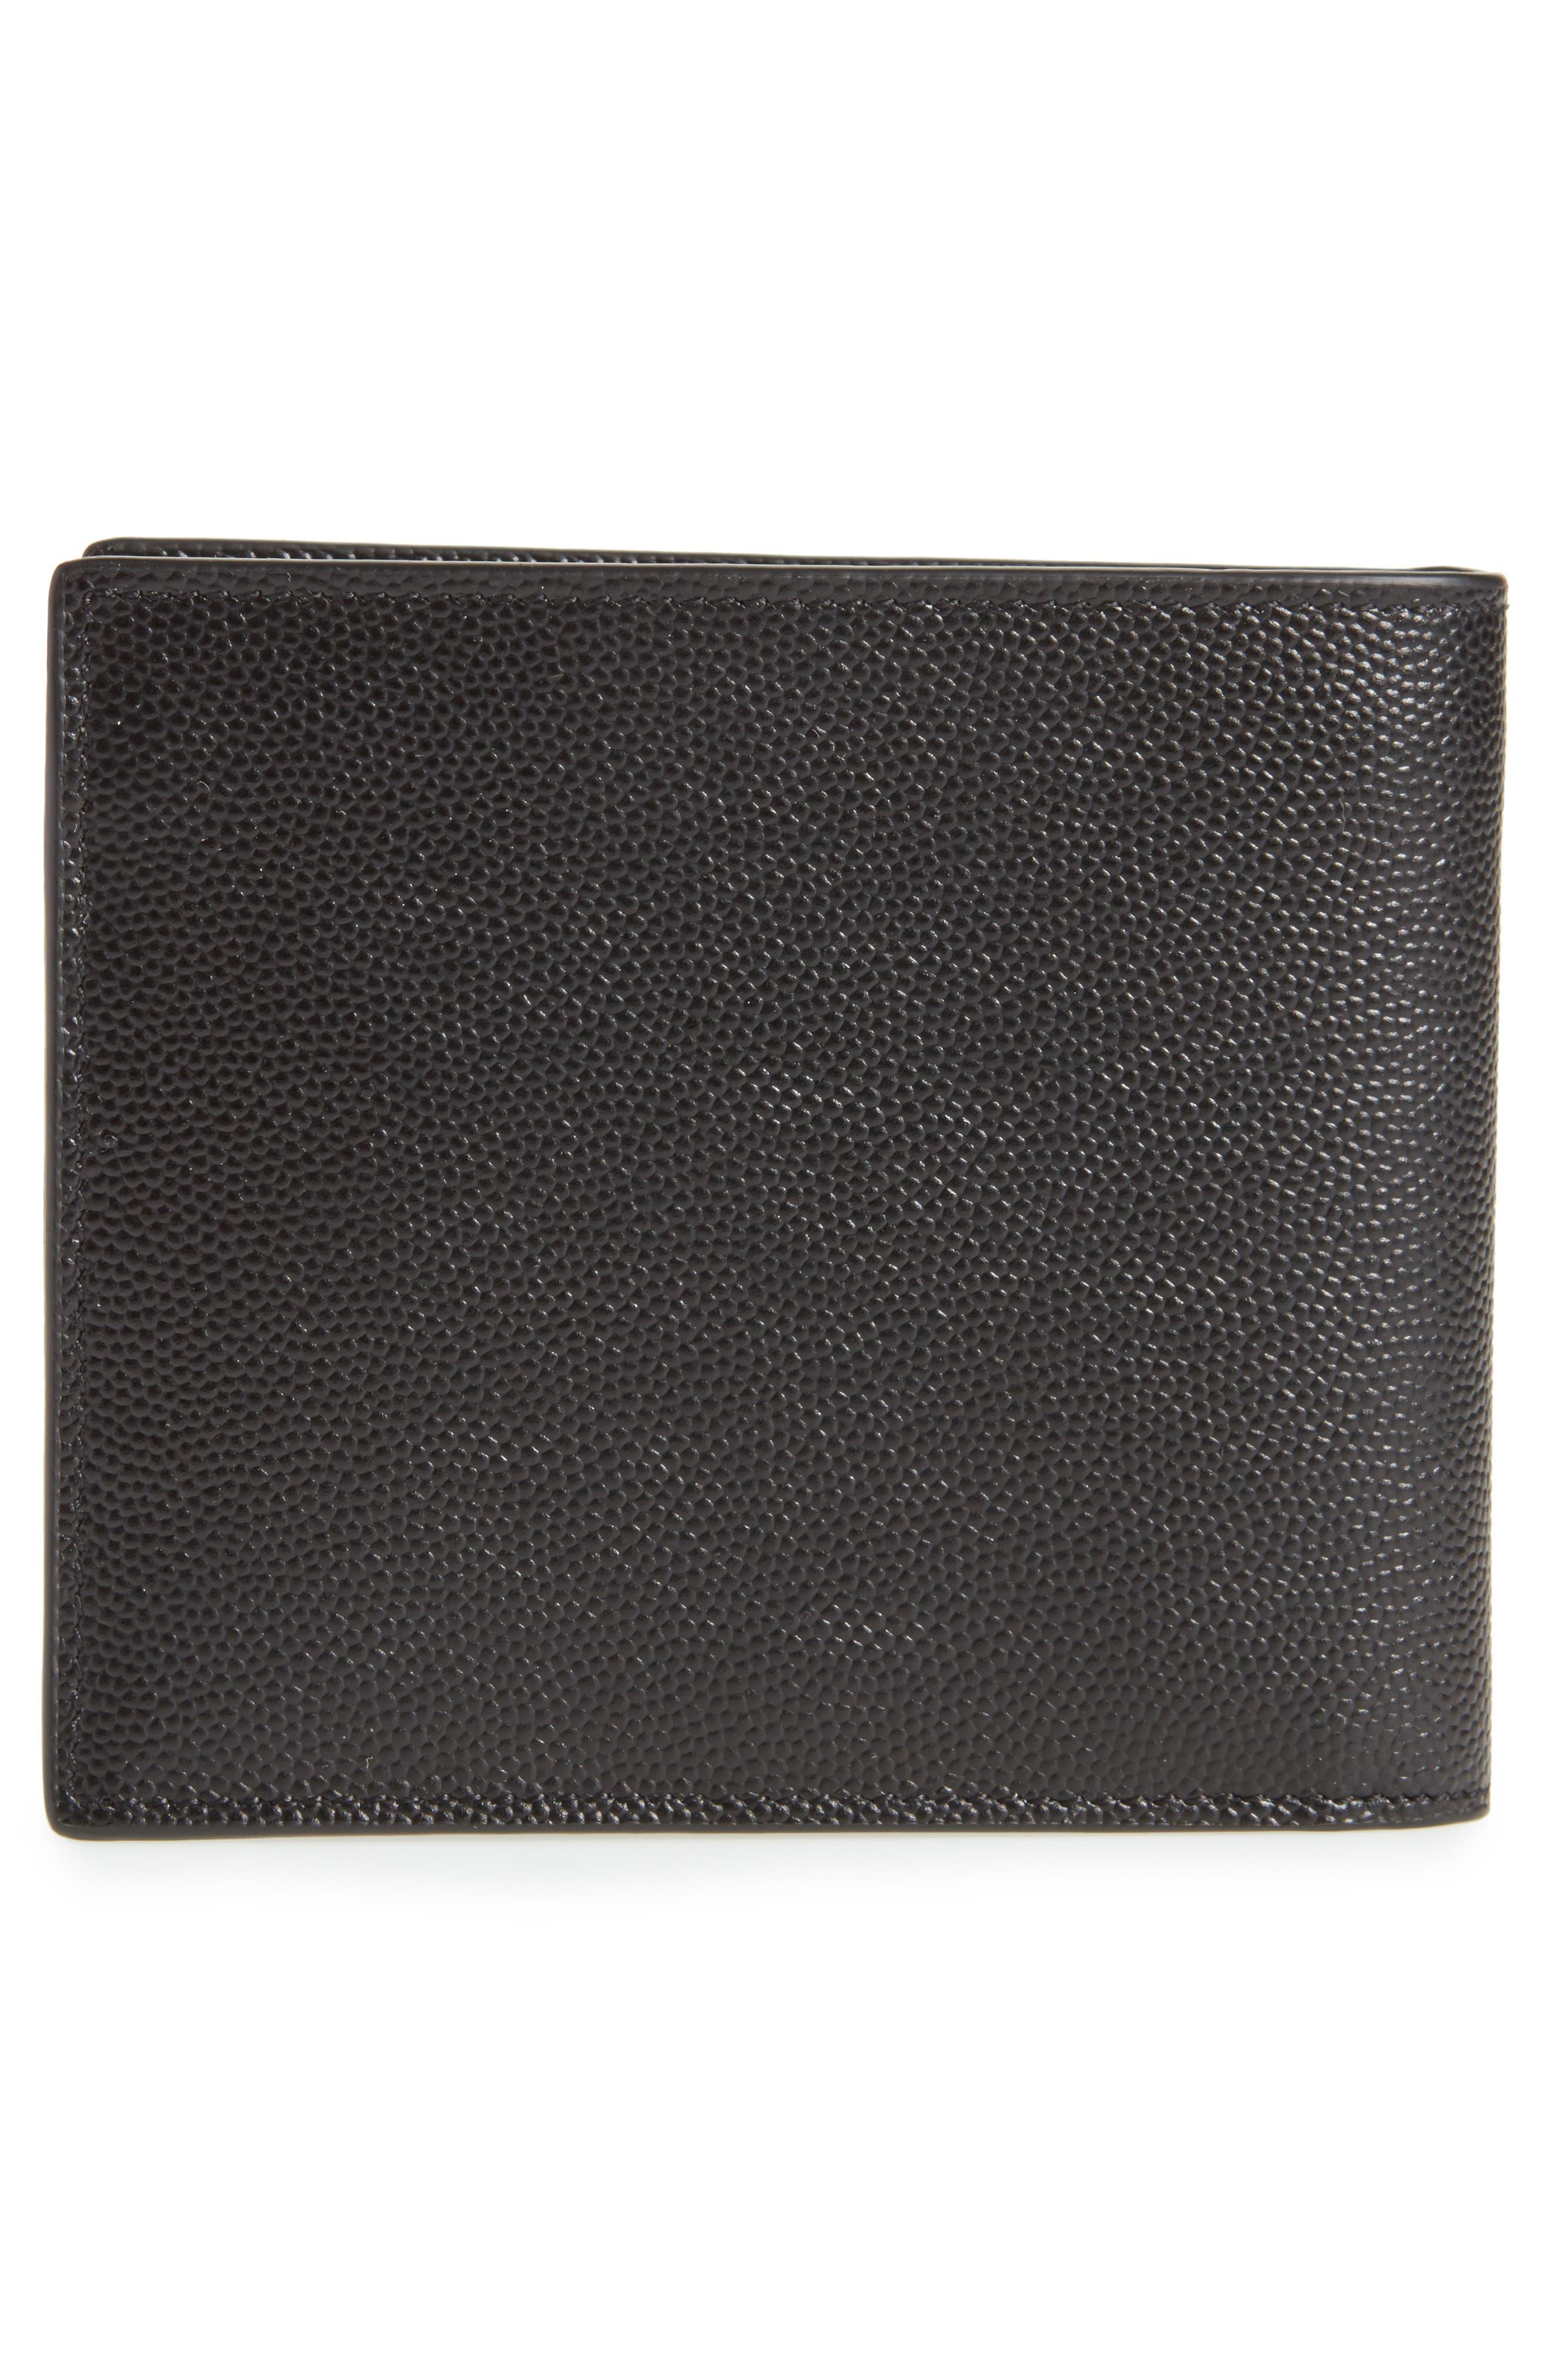 Pebble Grain Leather Wallet,                             Alternate thumbnail 3, color,                             Nero